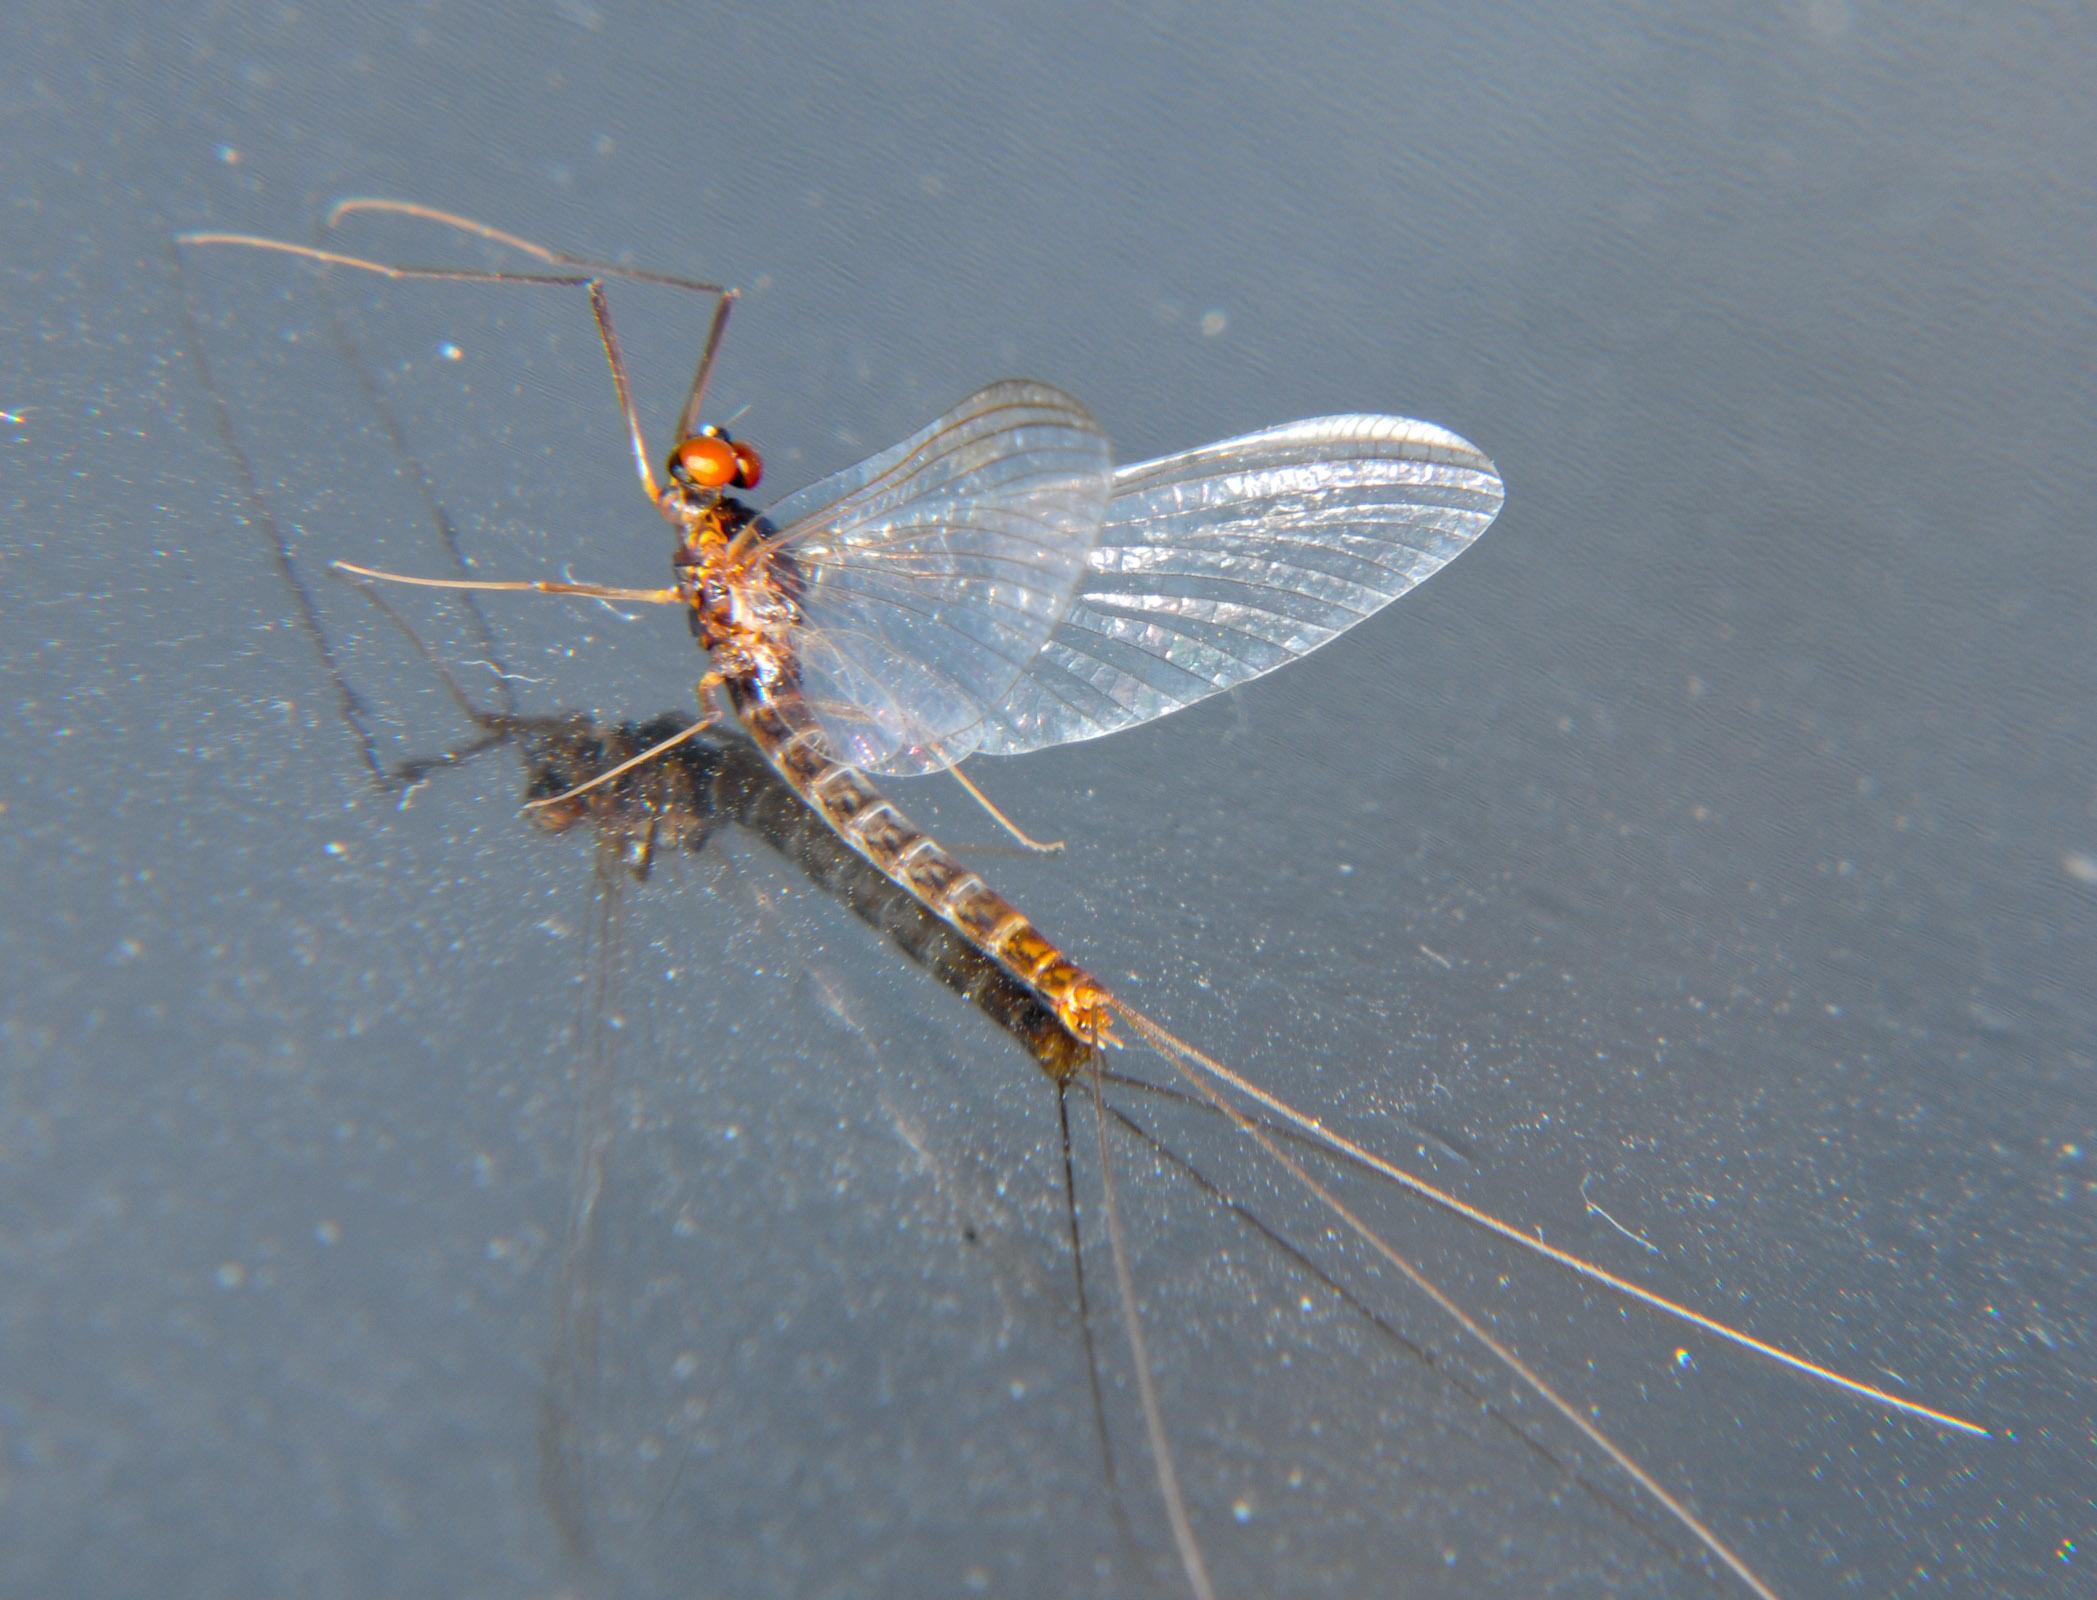 Male Paraleptophlebia bicornuta (Mahogany Dun) Mayfly Spinner from the Touchet River in Washington